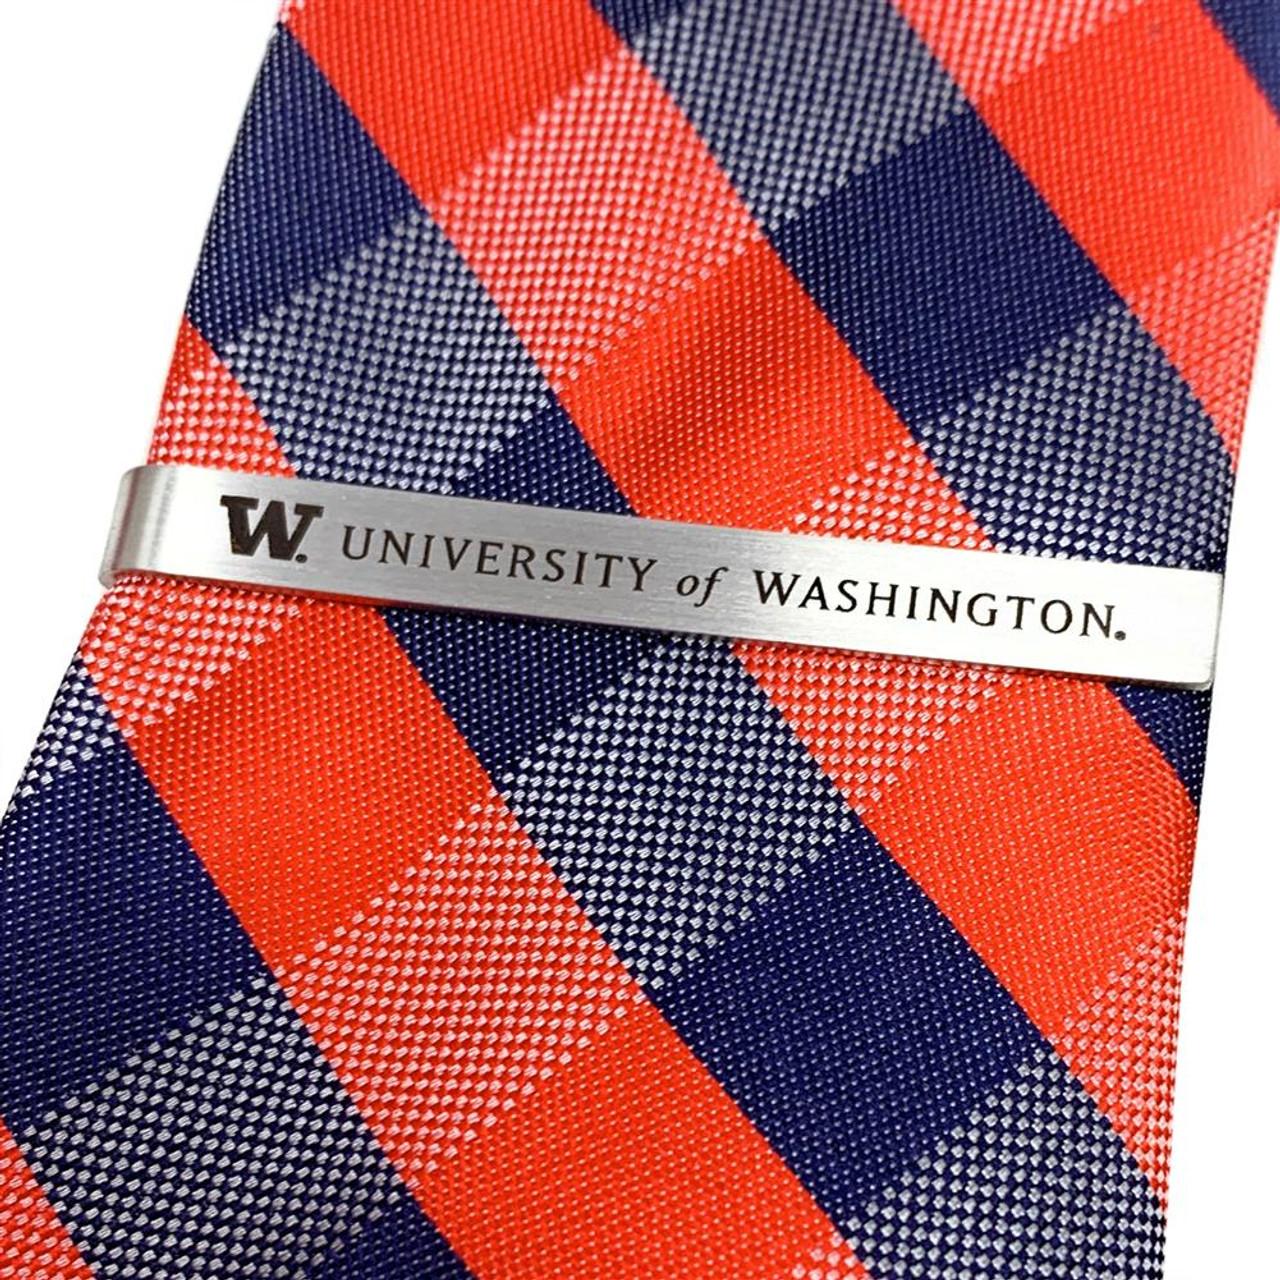 Villanova University Tie Clip Silver Tie Bar Gift Set